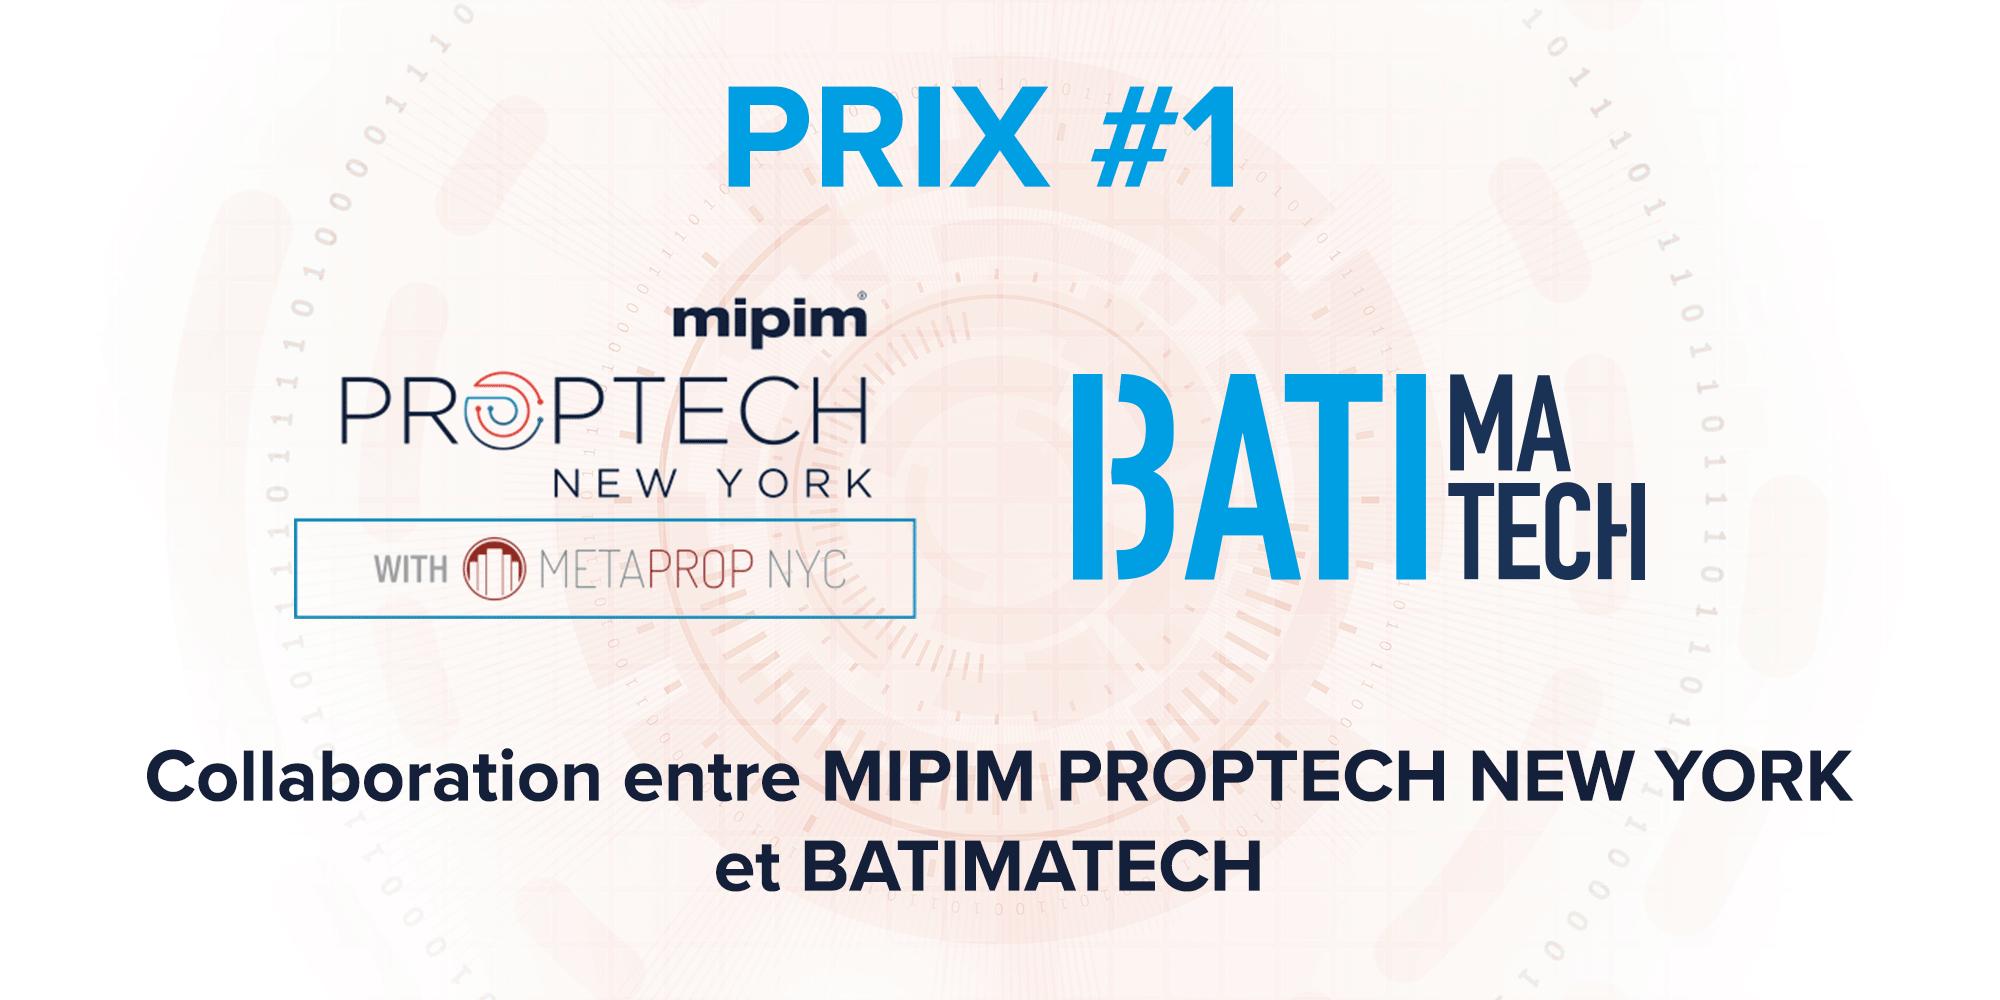 prix1_bati Mipim proptech Batimatech Montreal 1